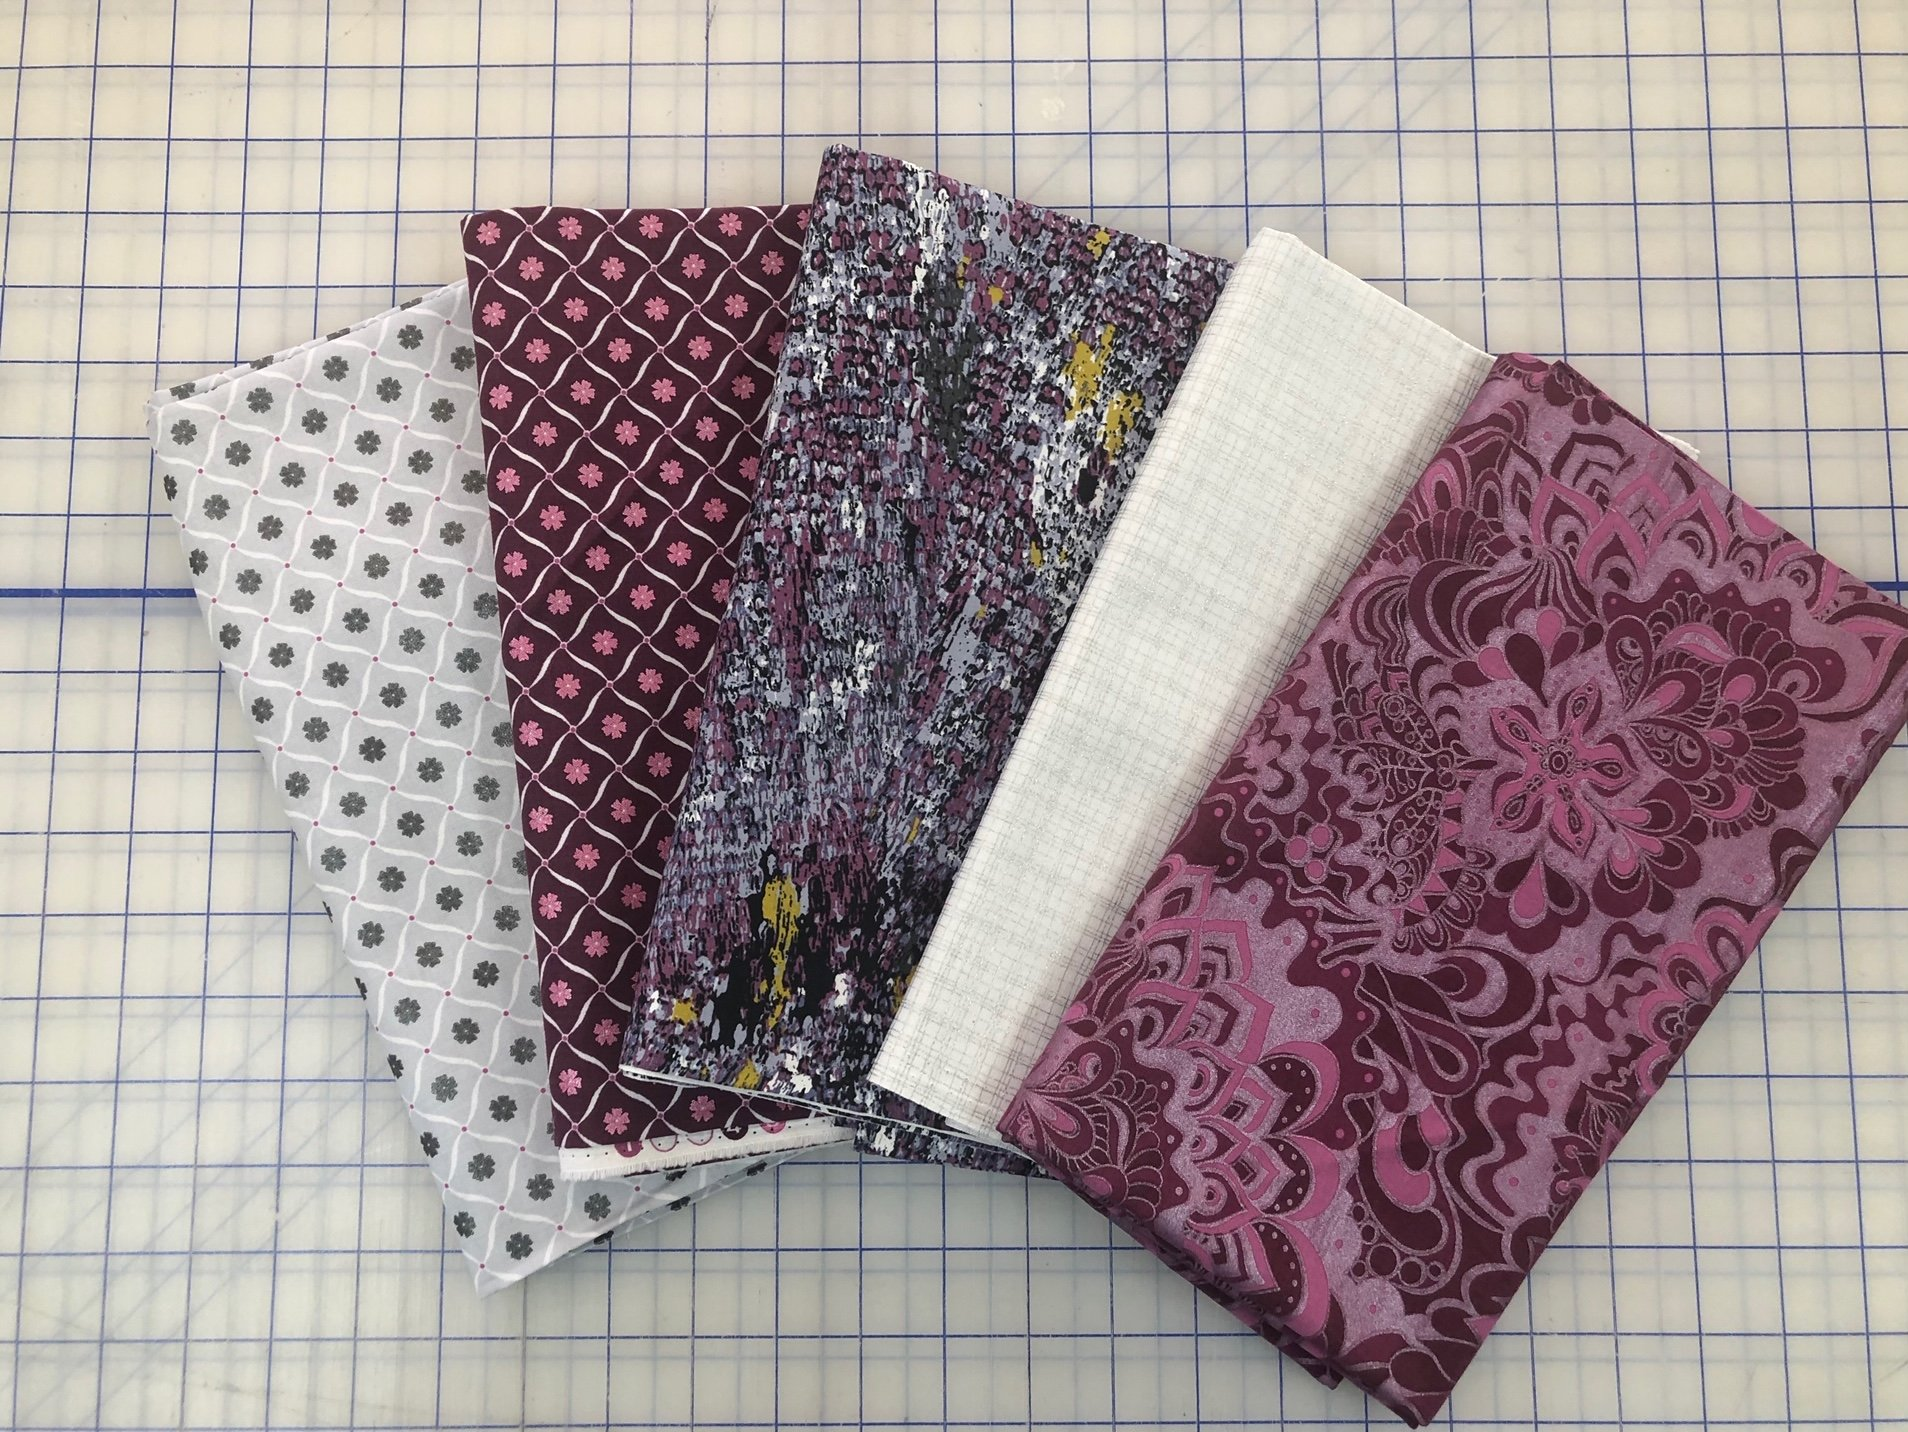 Five 1-Yard Cuts #8 (Sophisticated Purples)